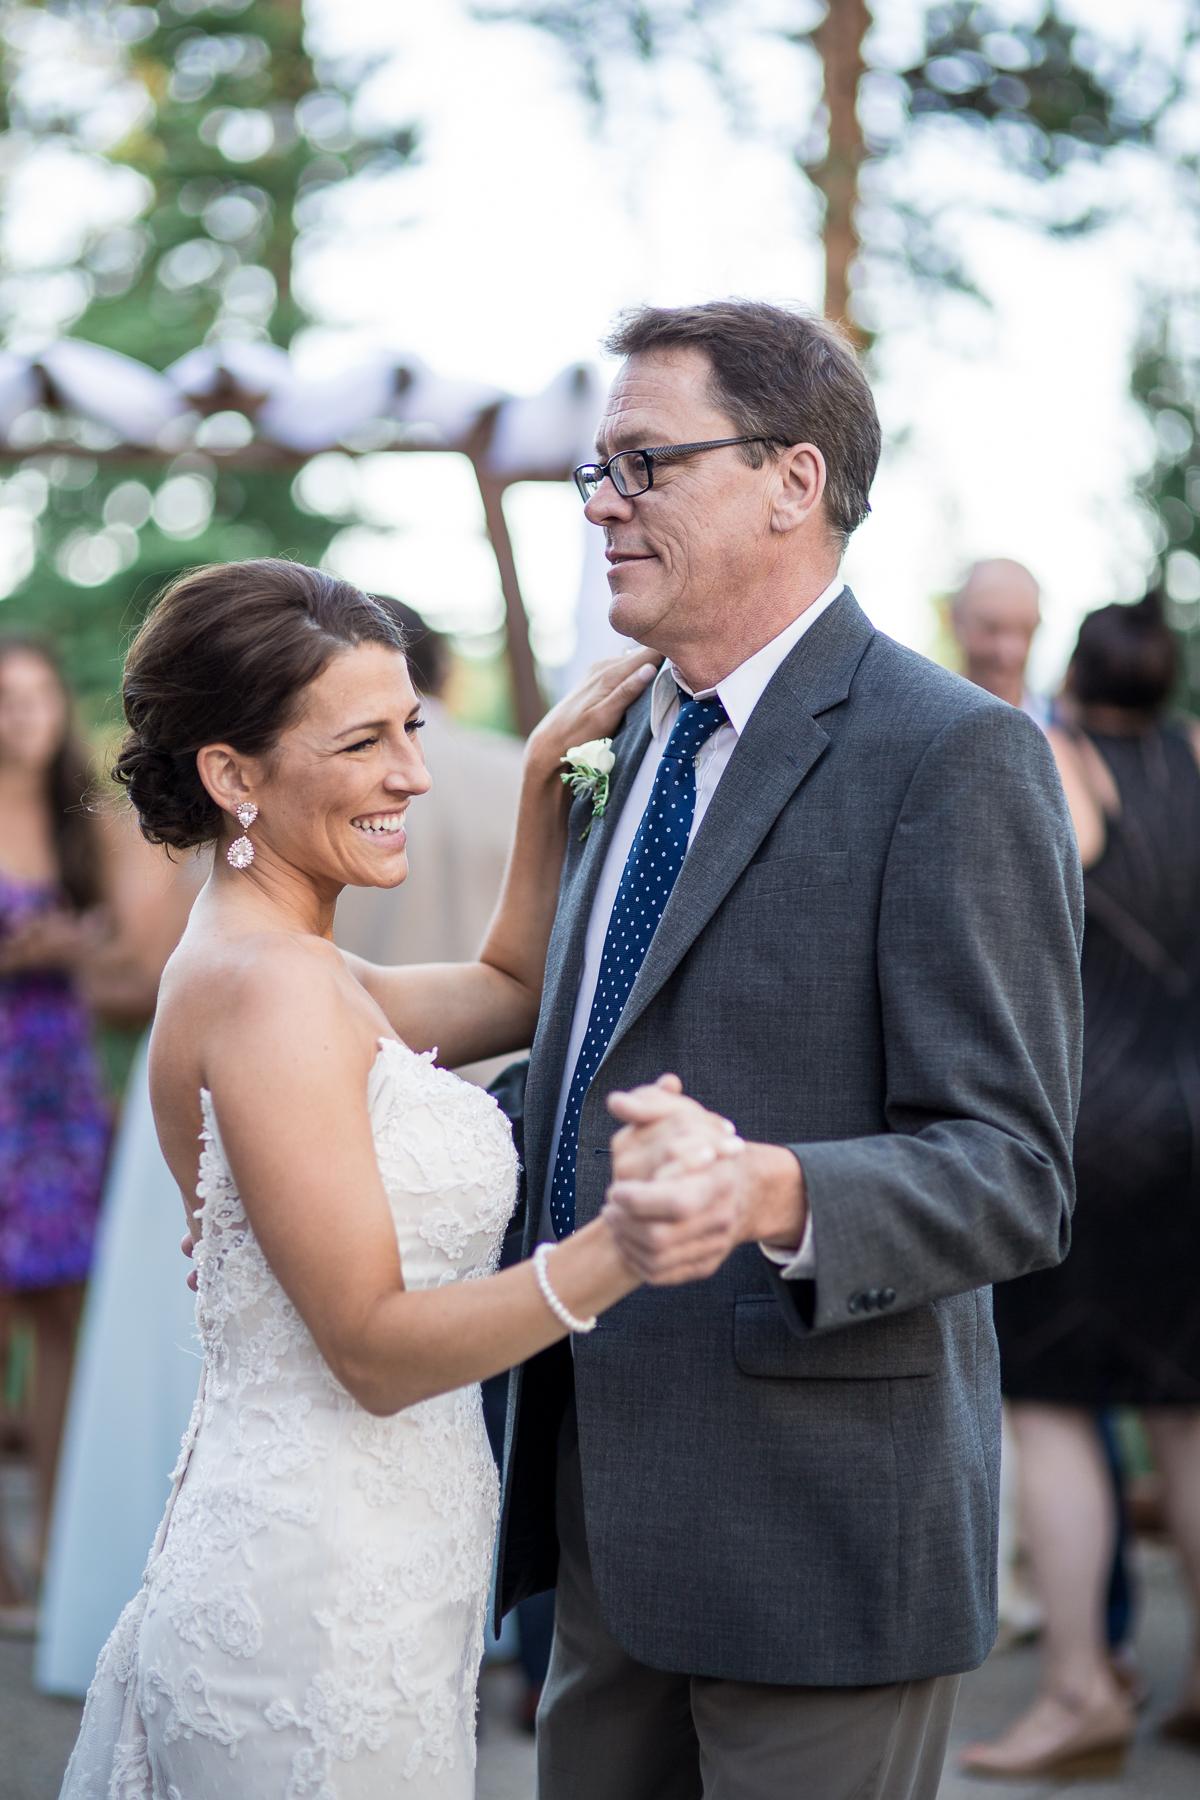 StaciDesign-Colorado-Wedding-5695.jpg